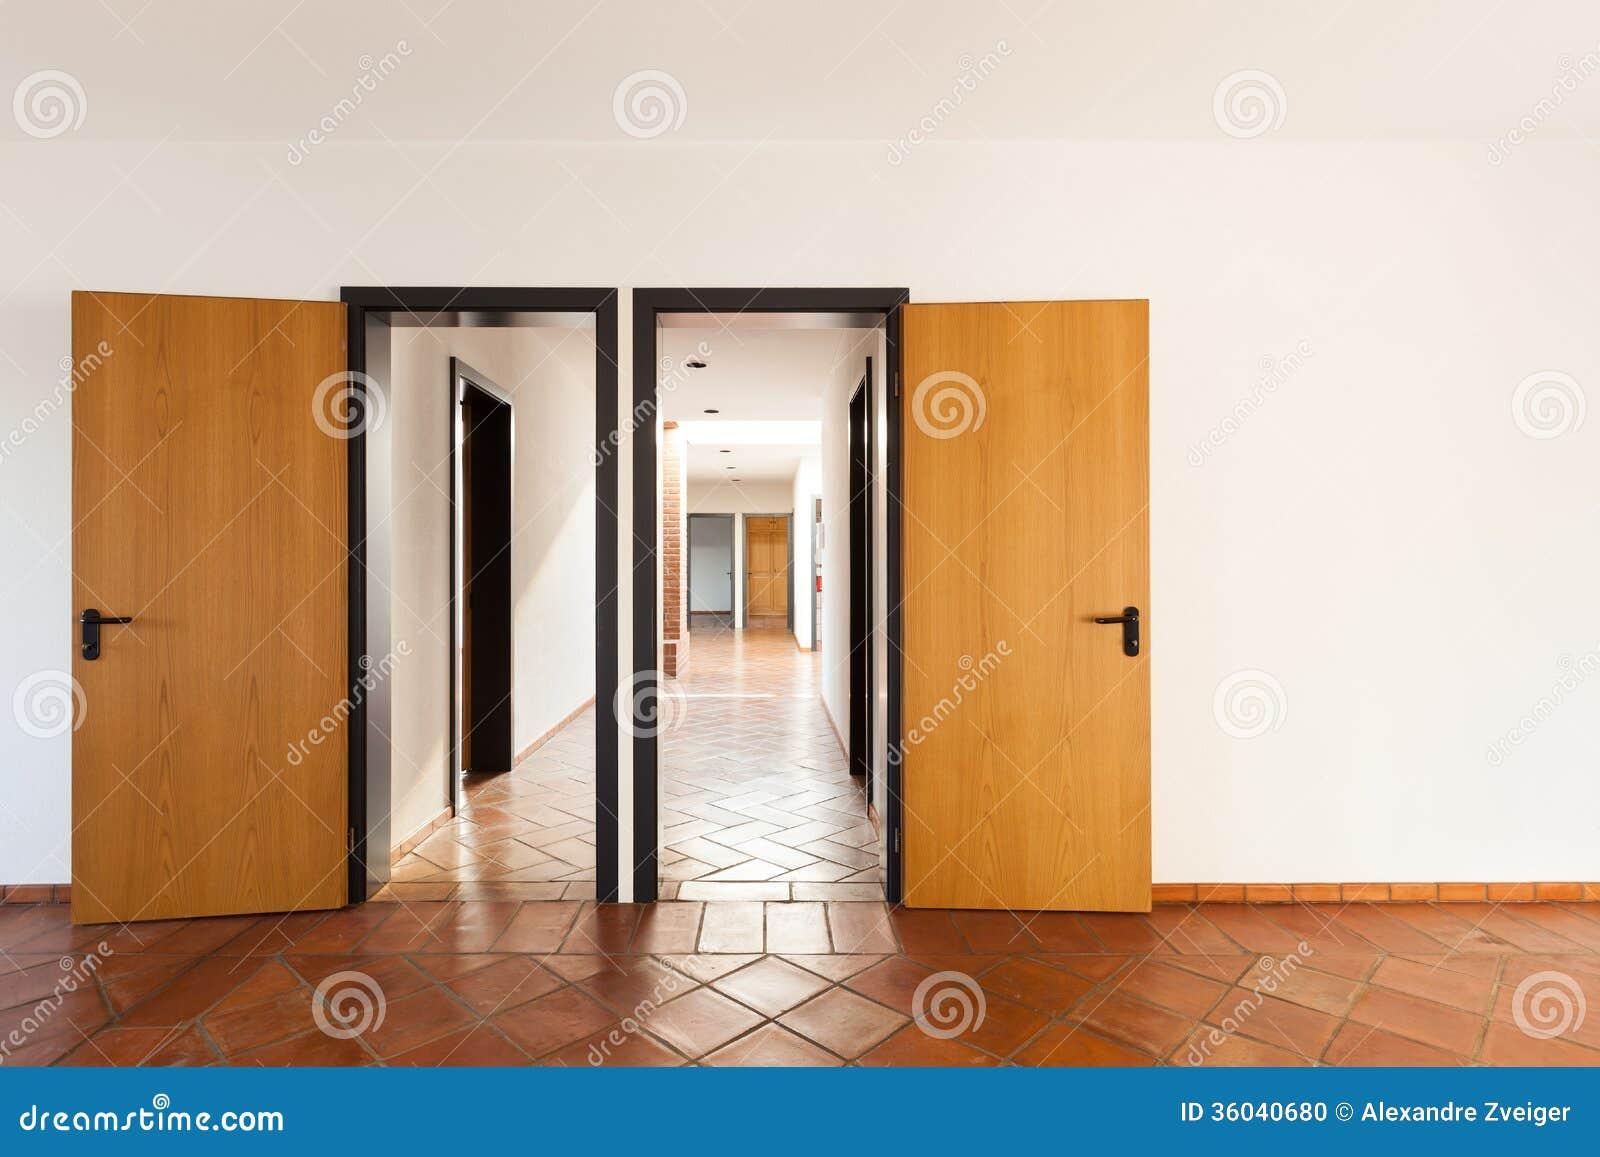 Stock Room Doors : Interior empty room with two doors stock photo image